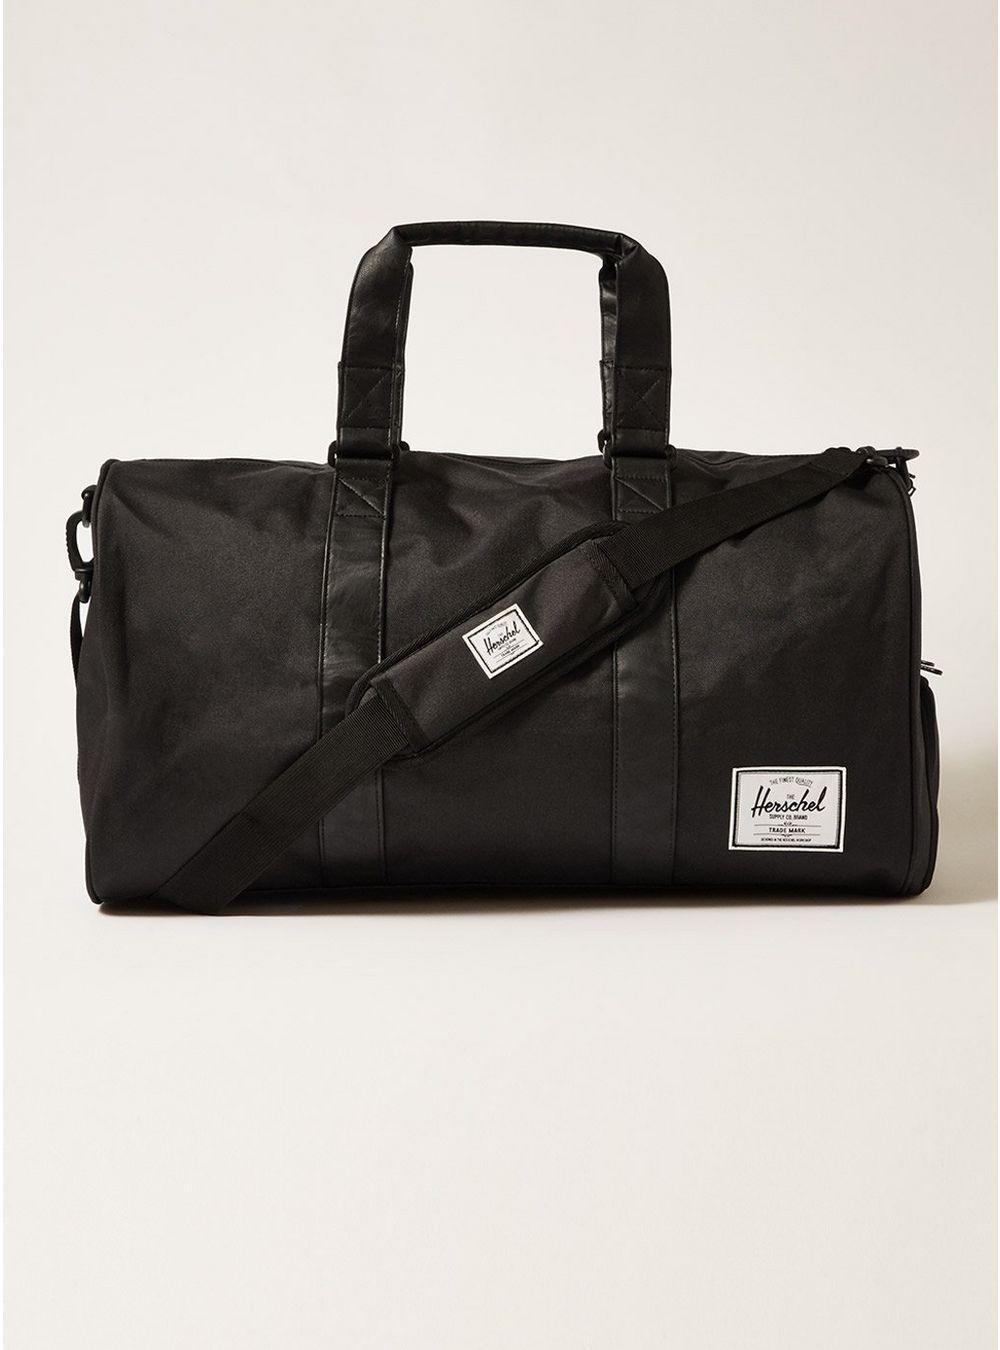 bc65c099b92a Herschel Supply Co. Black  sutton  Duffle Bag in Black for Men - Lyst